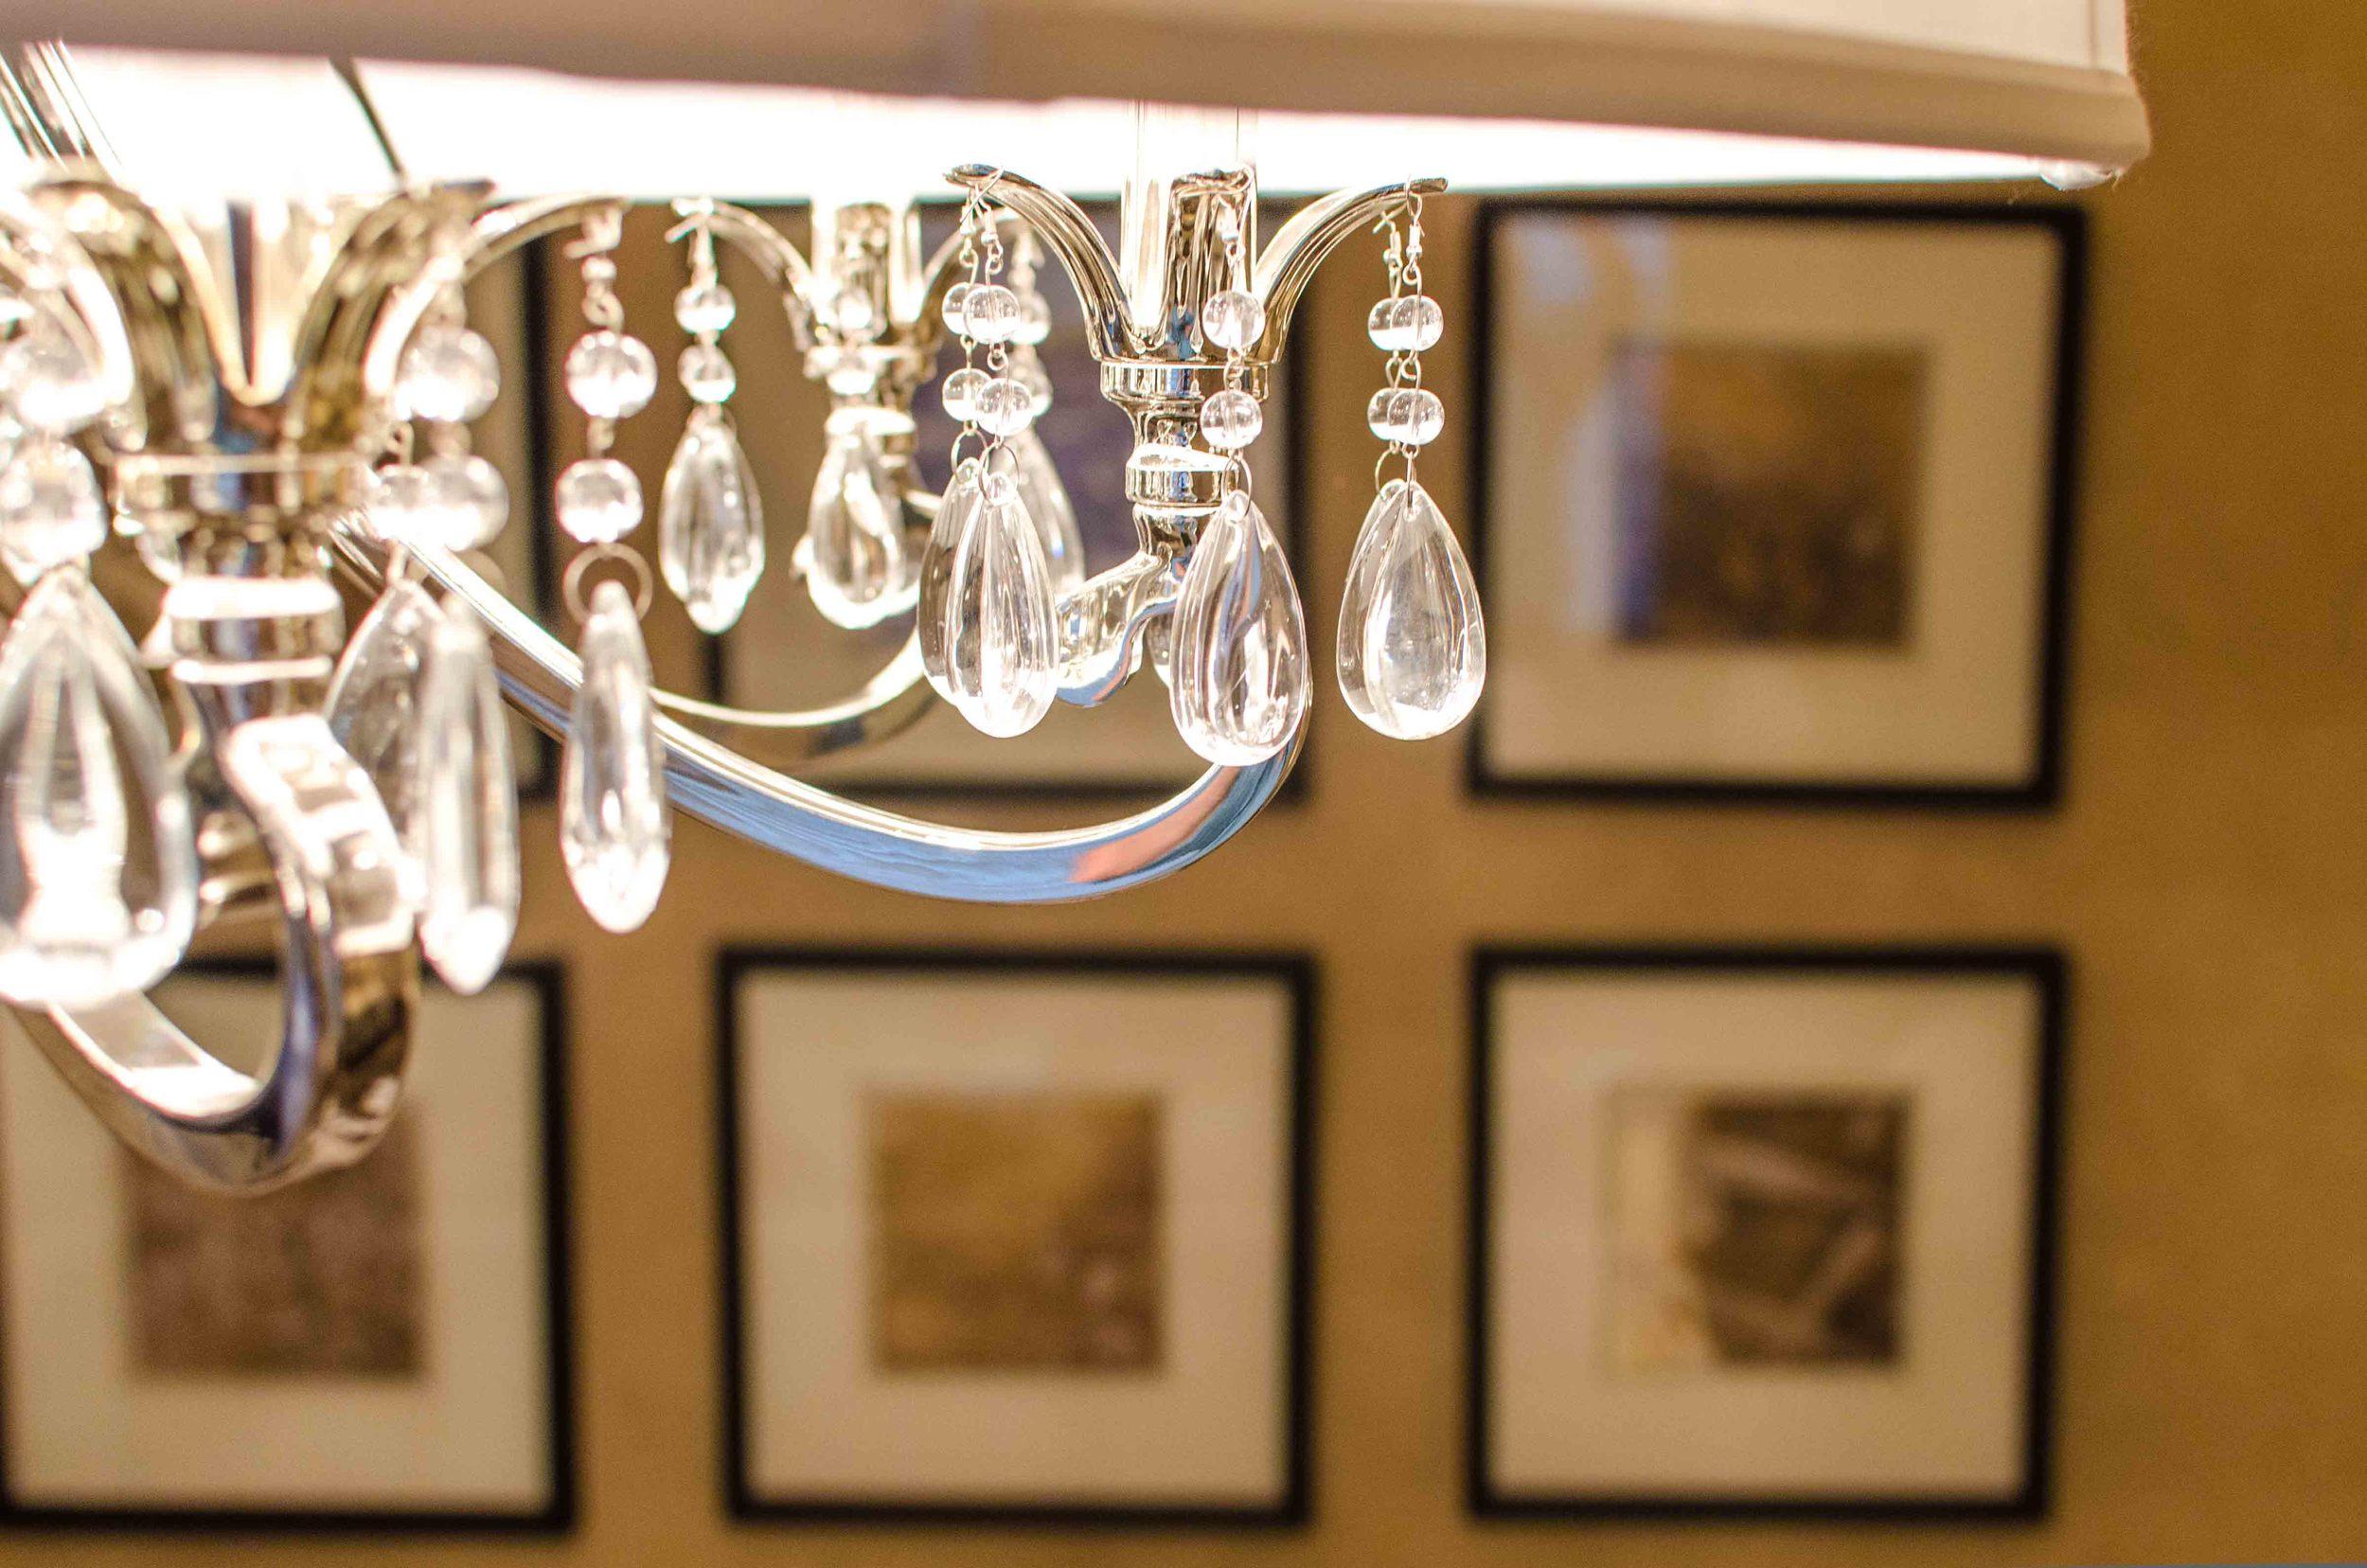 Close up of John Richard crystal chandelier